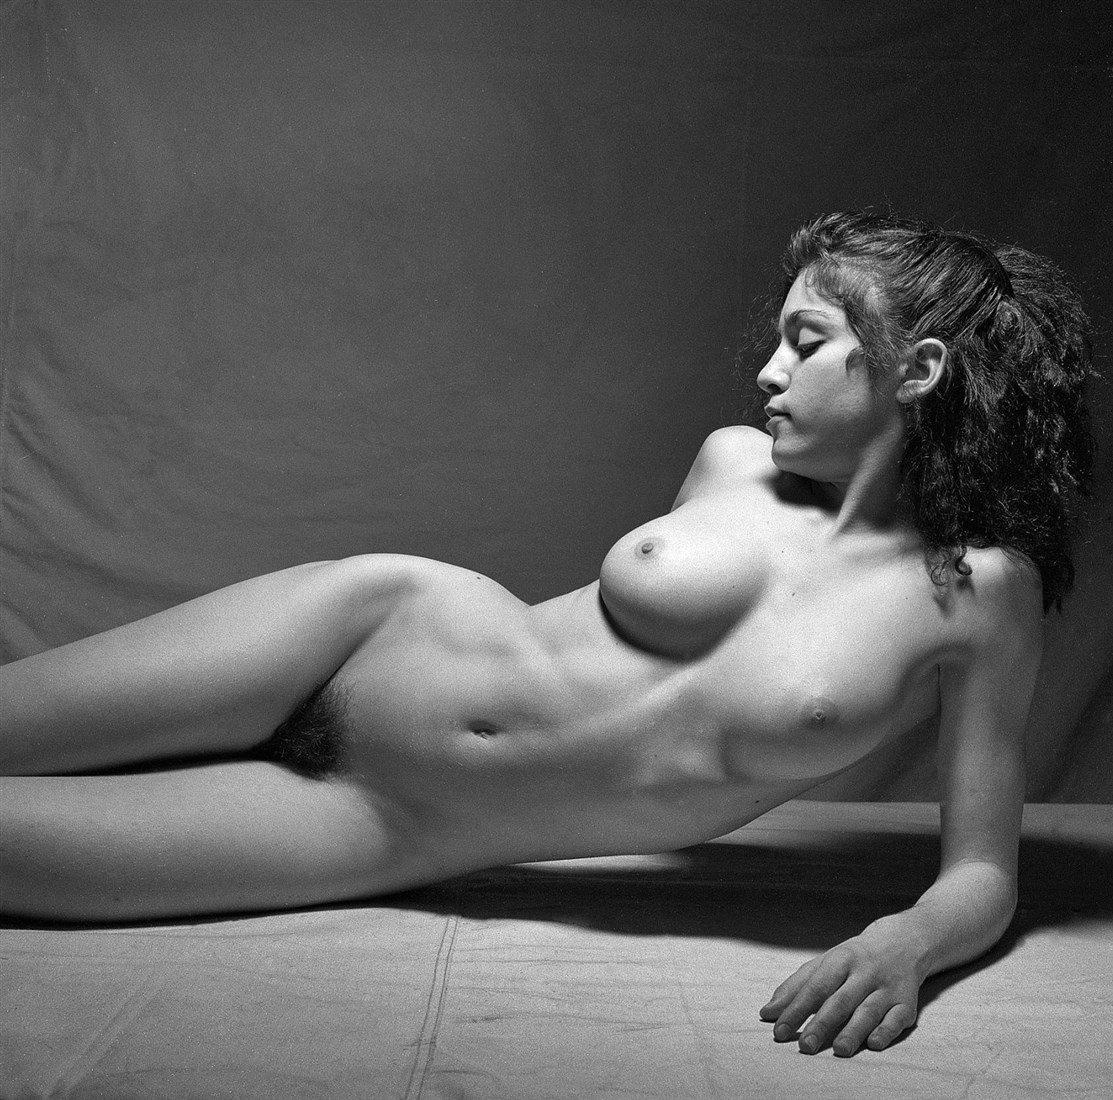 Nude Celeb Photo Shoots